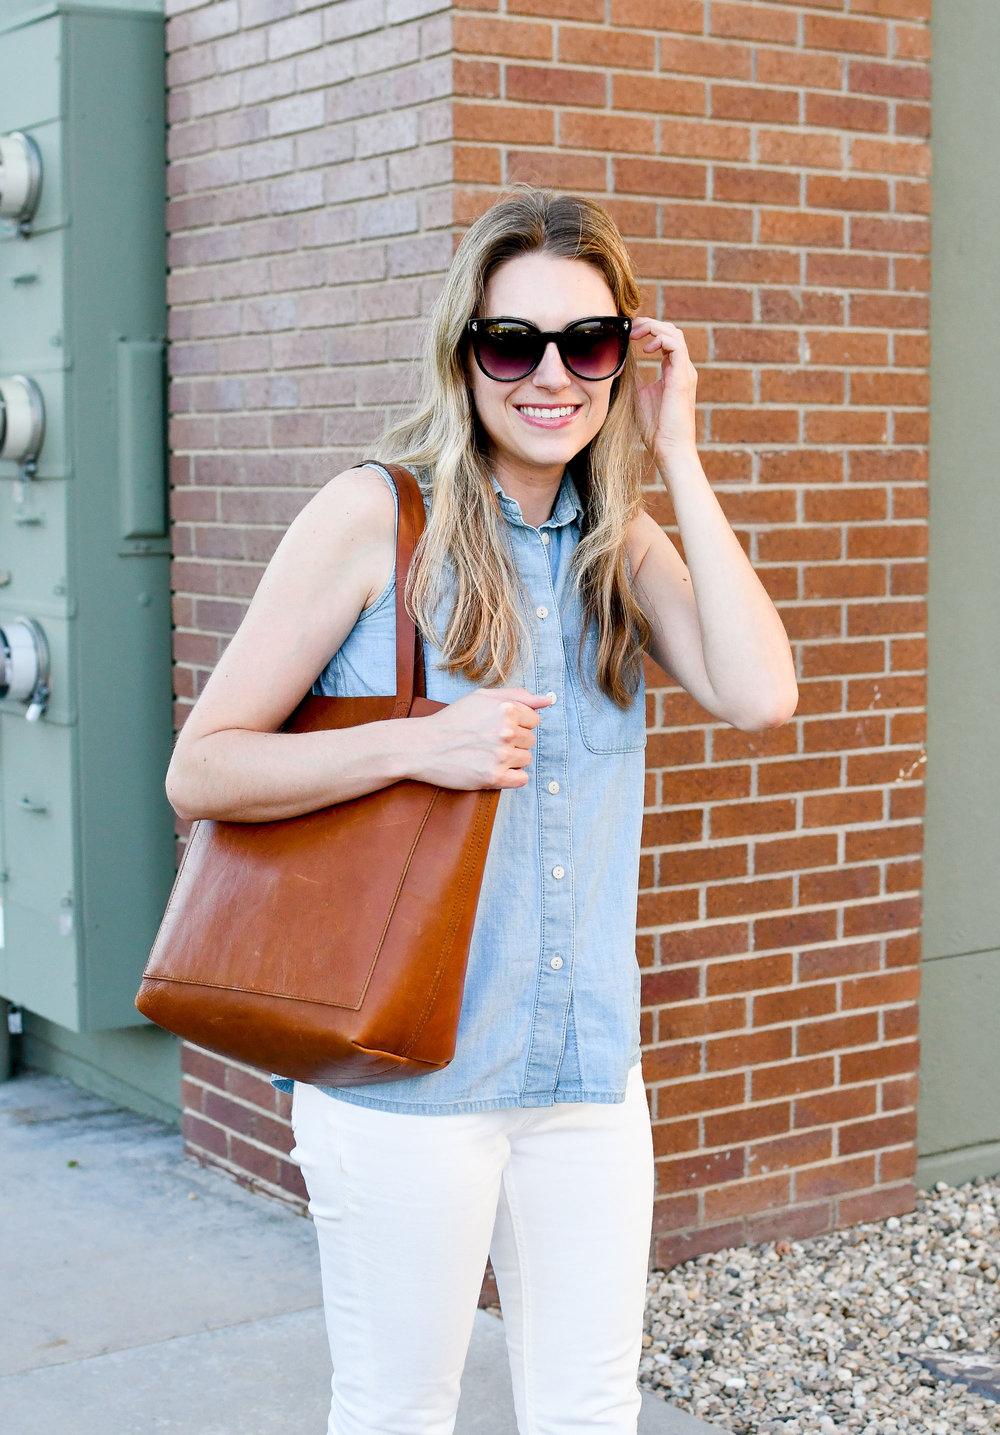 Moorea Seal sunglasses — Cotton Cashmere Cat Hair